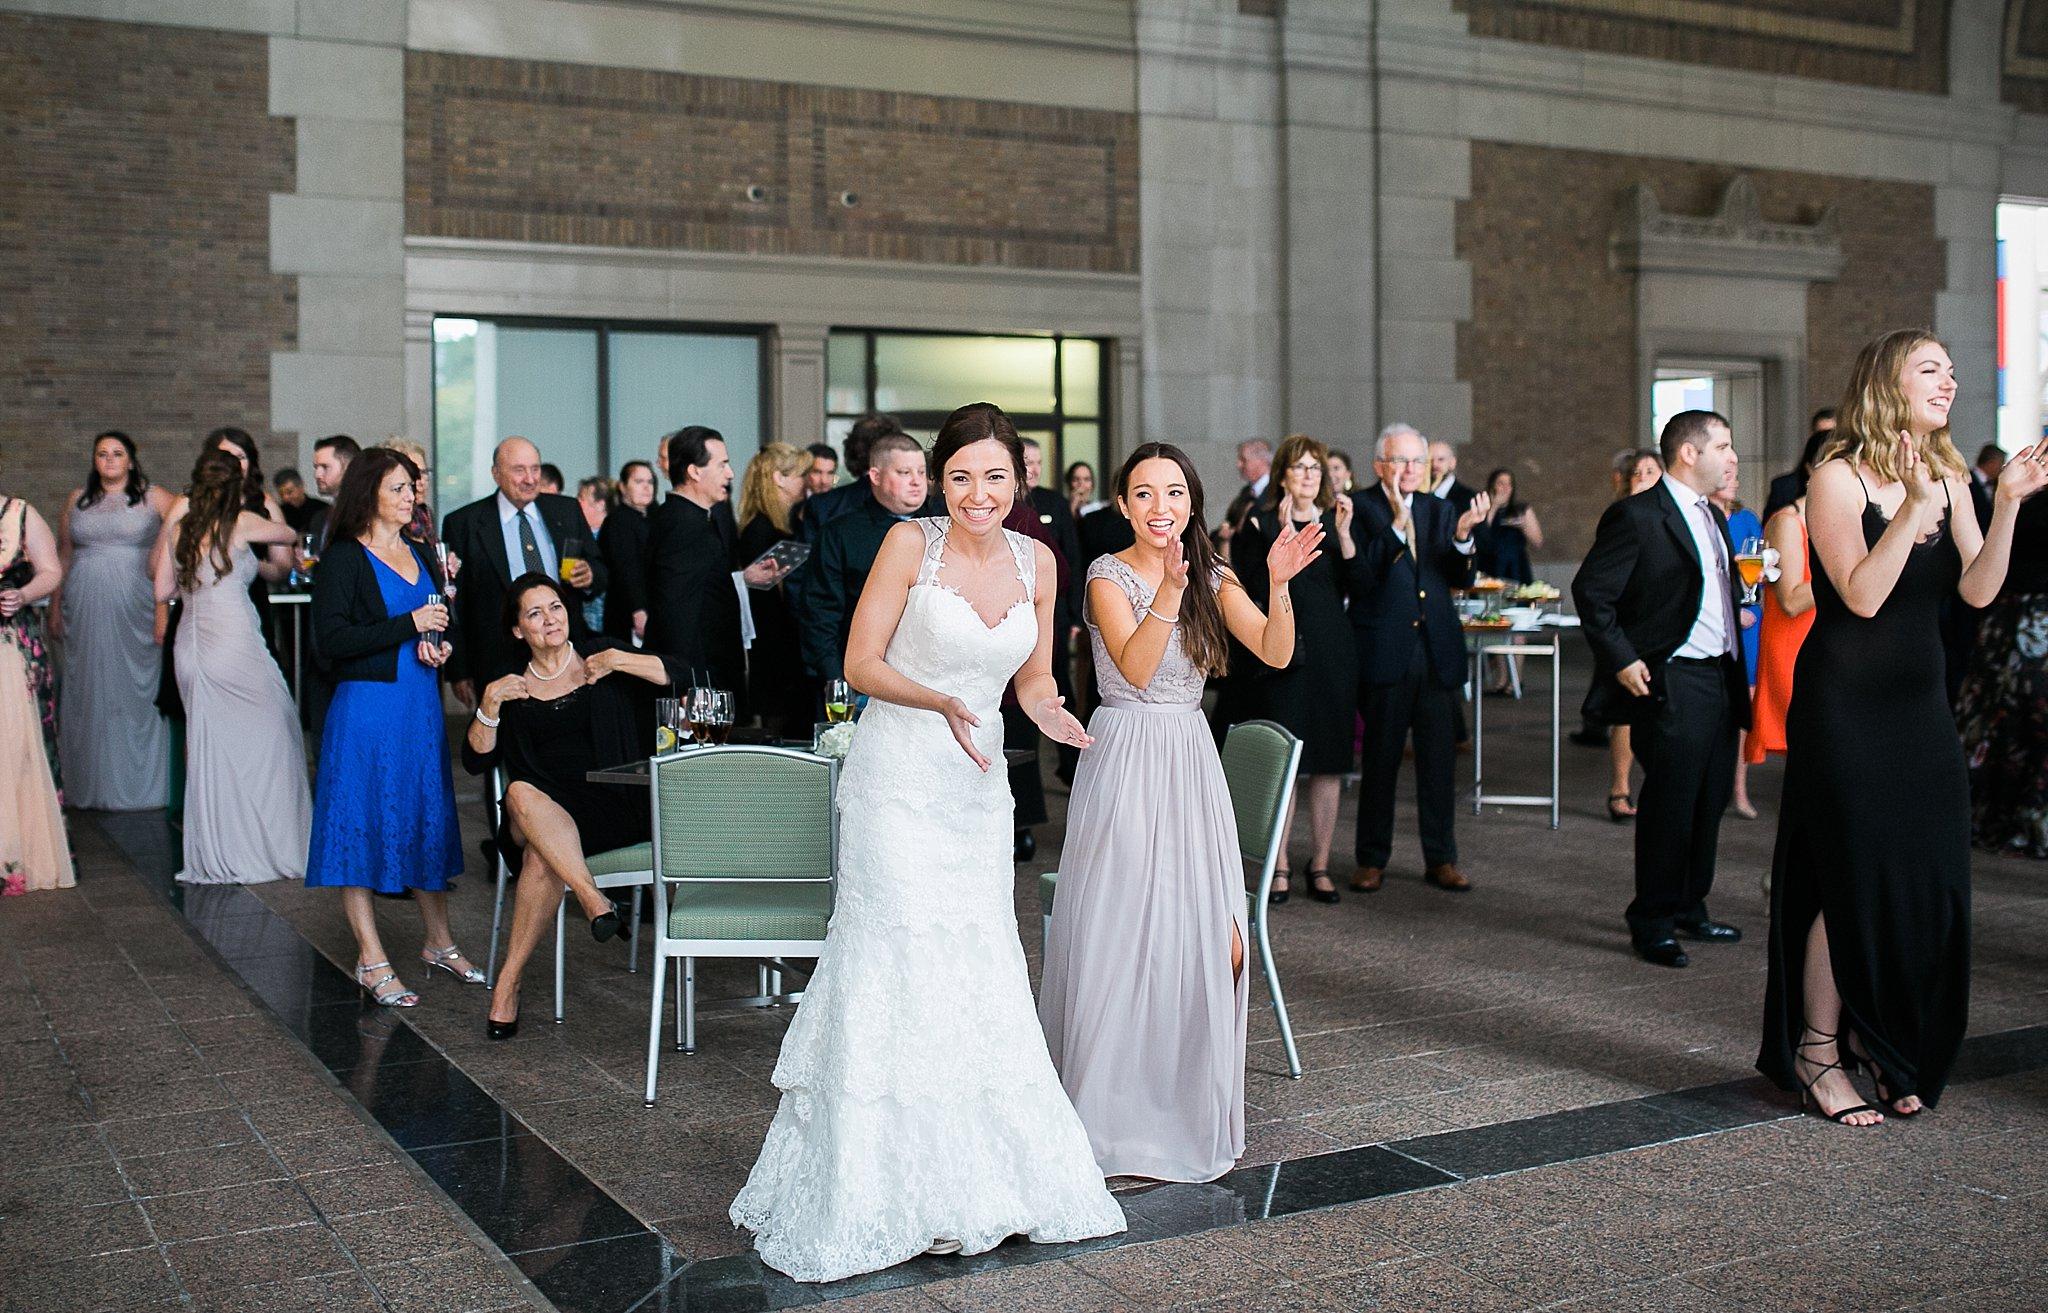 Seaport Hotel Wedding Boston Photographer Sweet Alice59.jpg